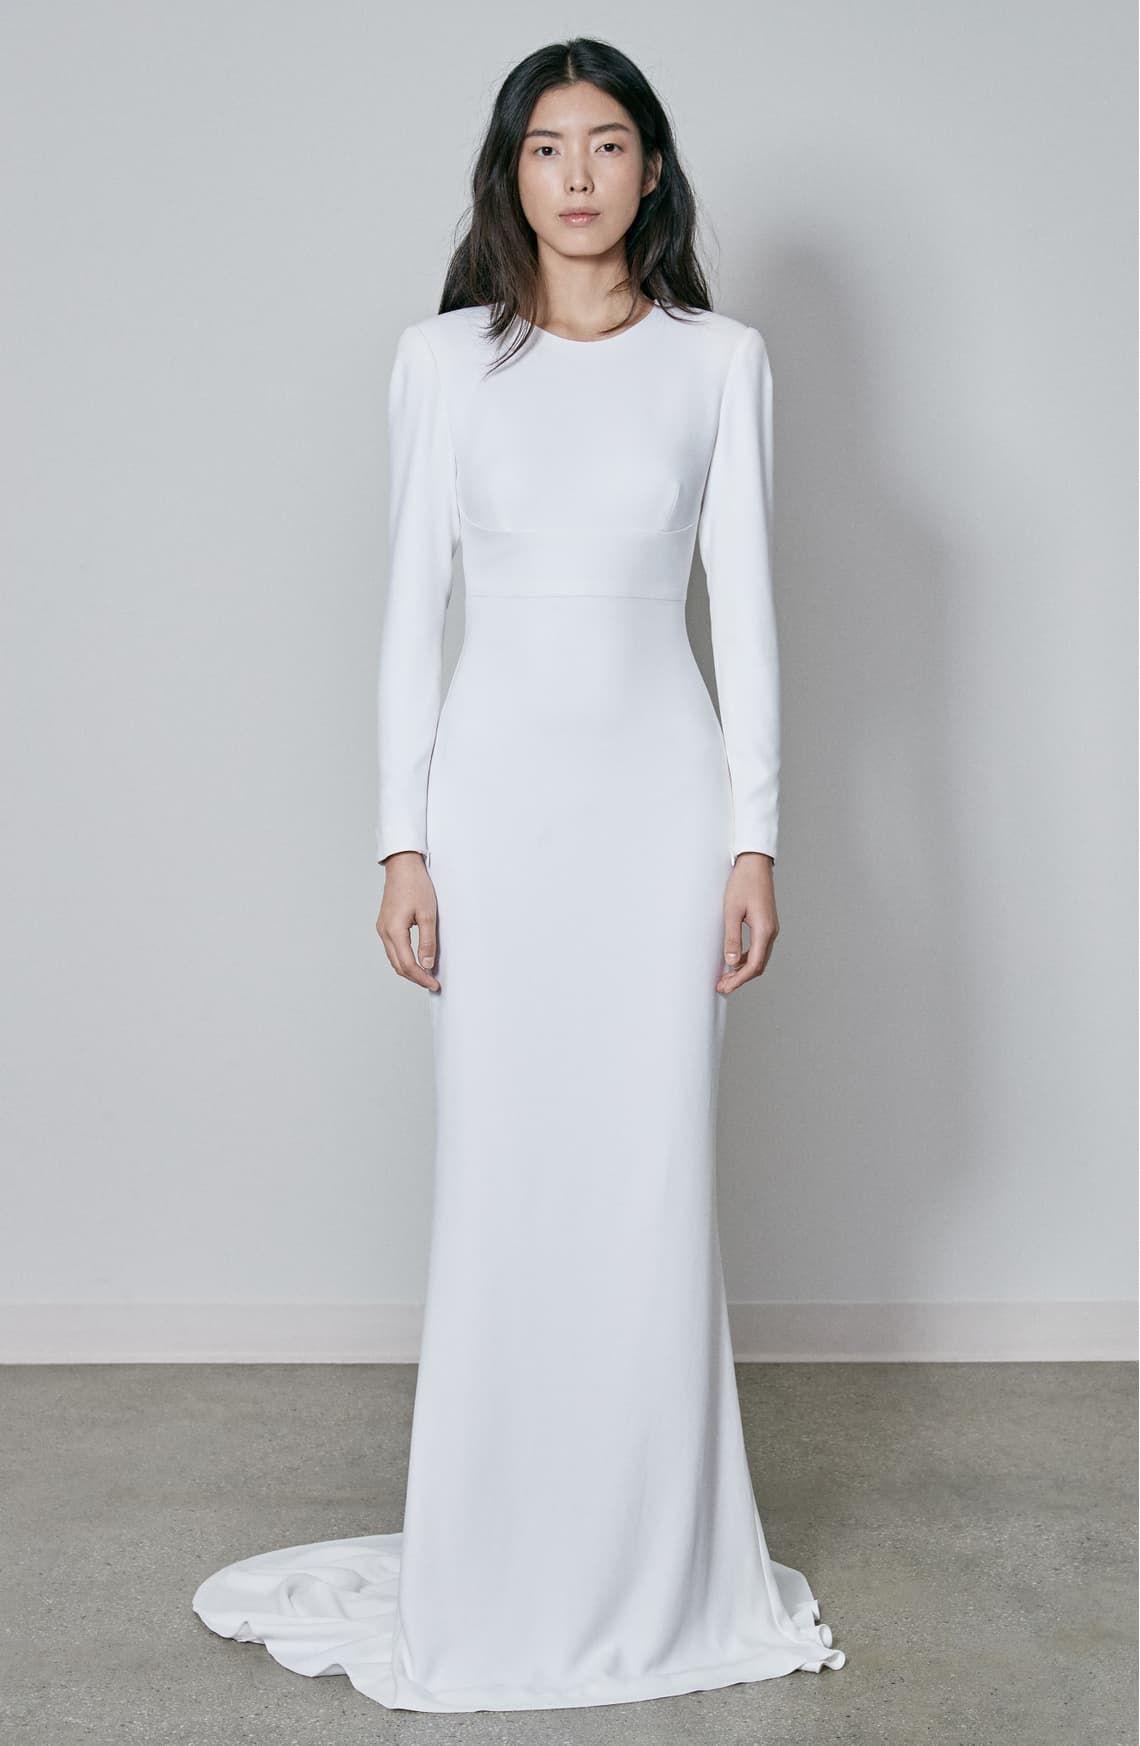 Stella Mccartney F18 Ruby Long Sleeve Cutout Wedding Dress Nordstrom Dresses Gowns Of Elegance Nordstrom Dresses [ 1746 x 1140 Pixel ]